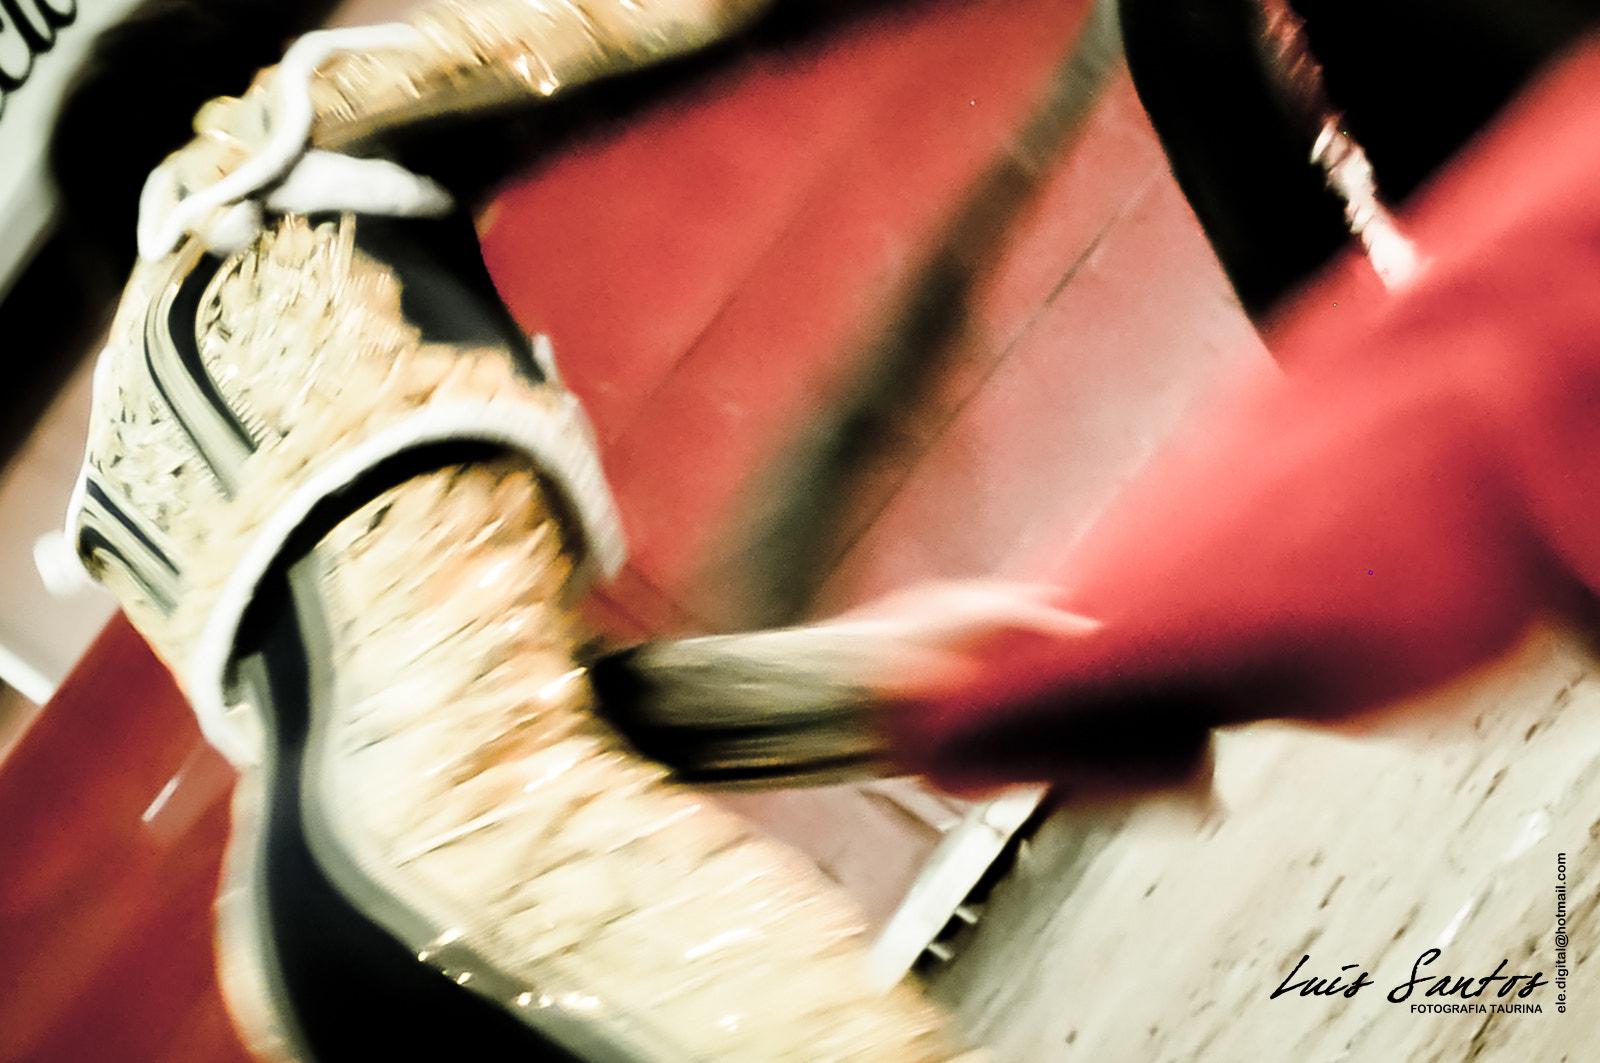 Castella in motion